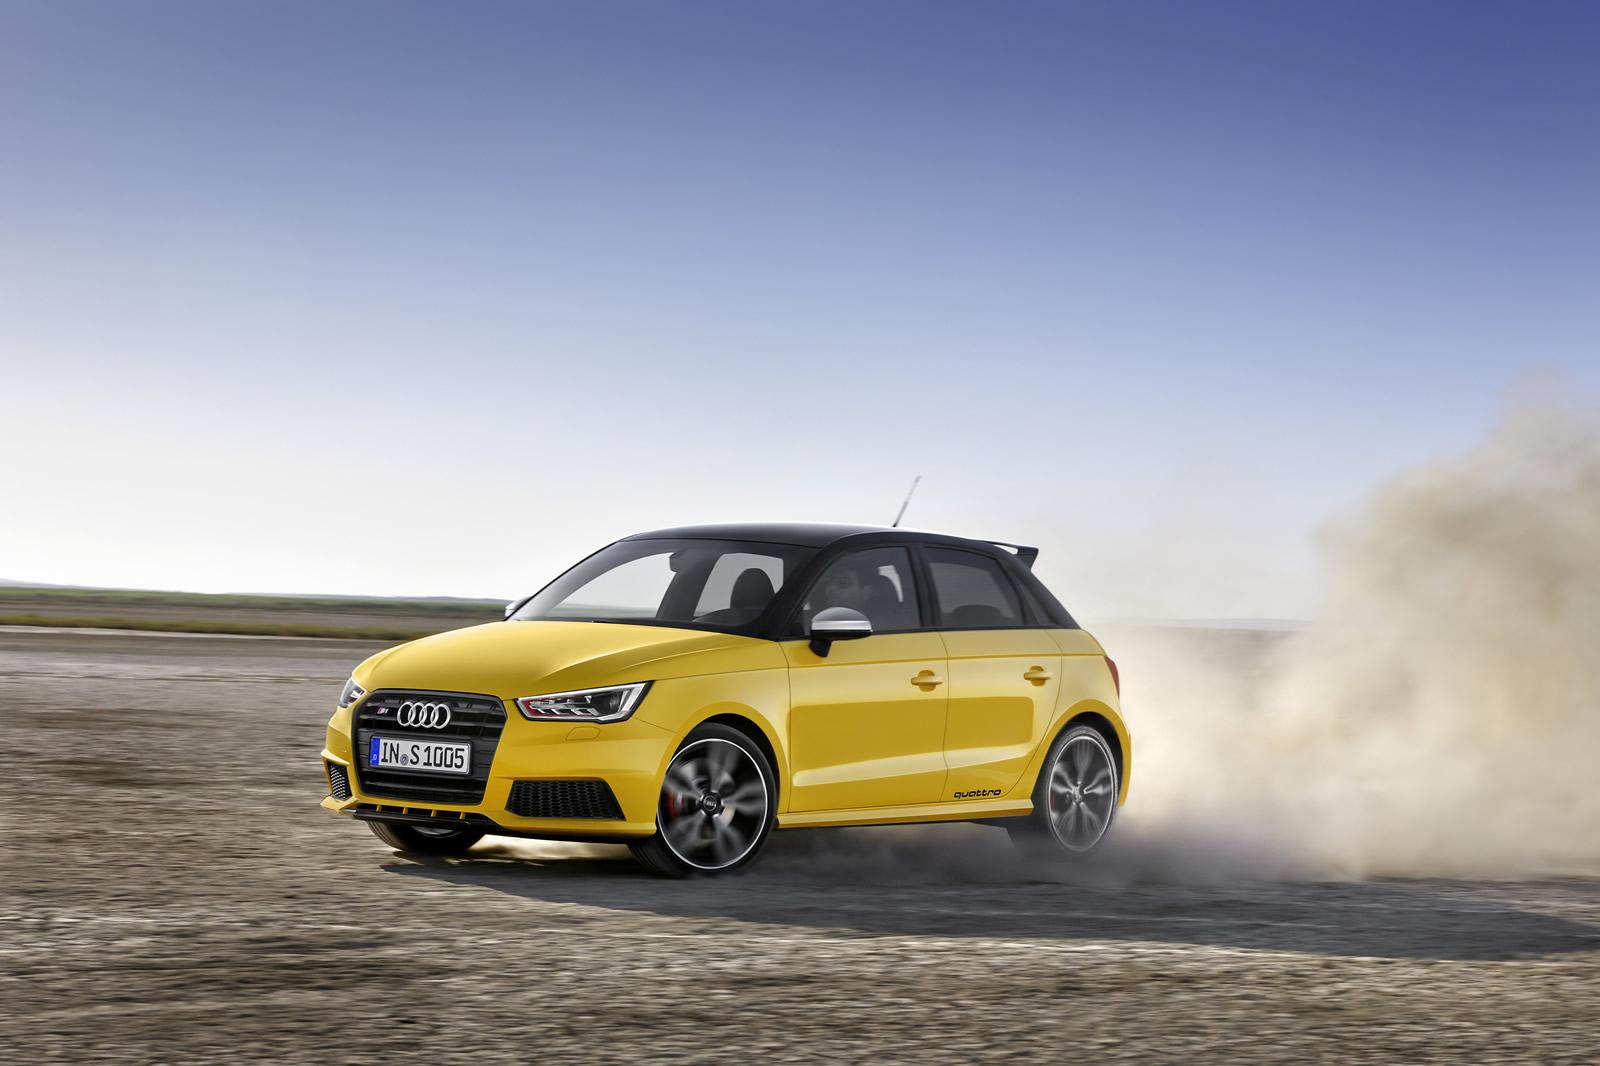 Ауди А1 Клуб отзывы цены фото Audi A1